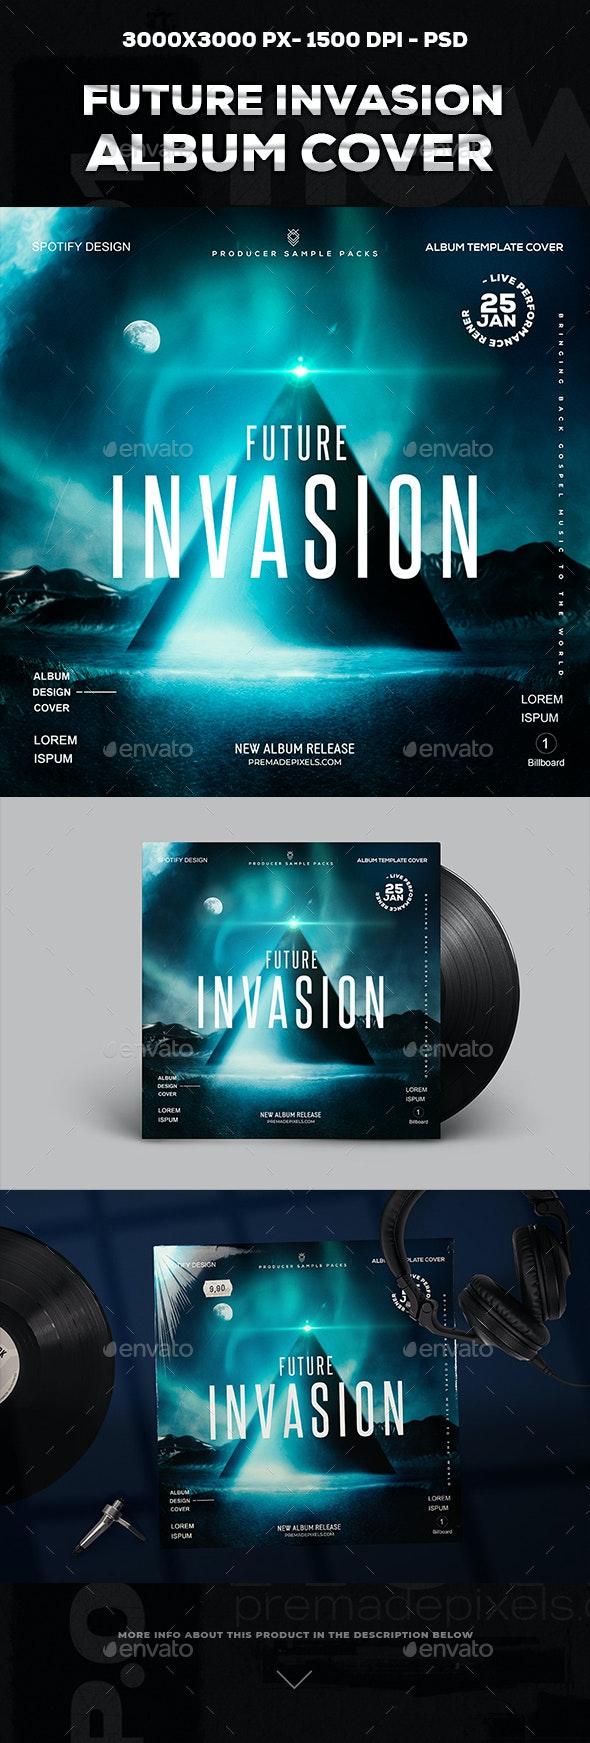 Future Invasion Album Cover - Social Media Web Elements